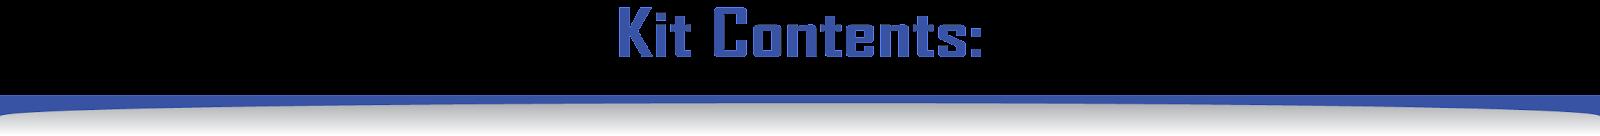 kitcontents.png